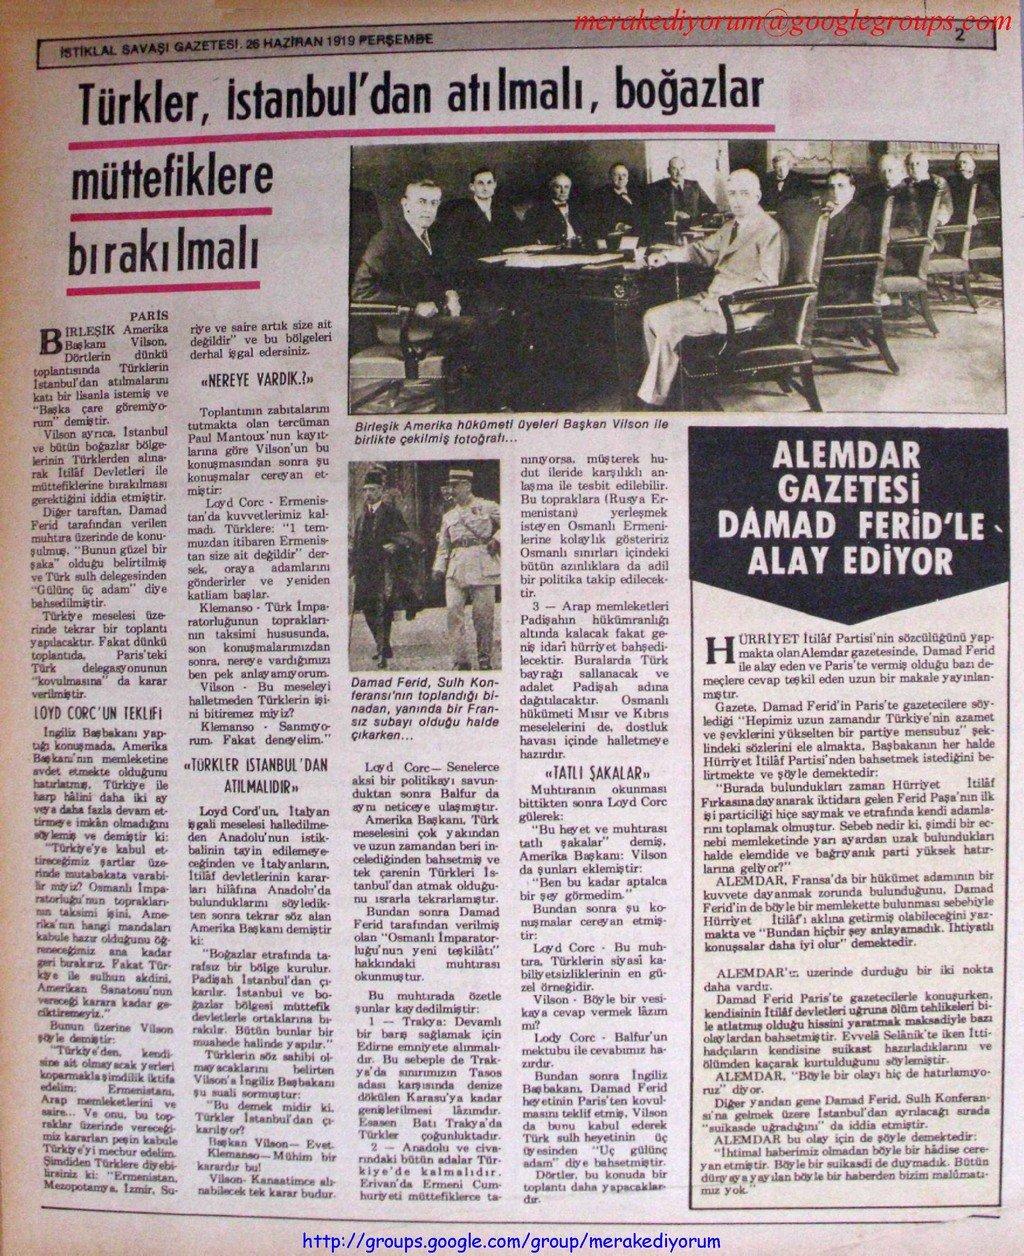 istiklal savaşı gazetesi - 26 haziran 1919